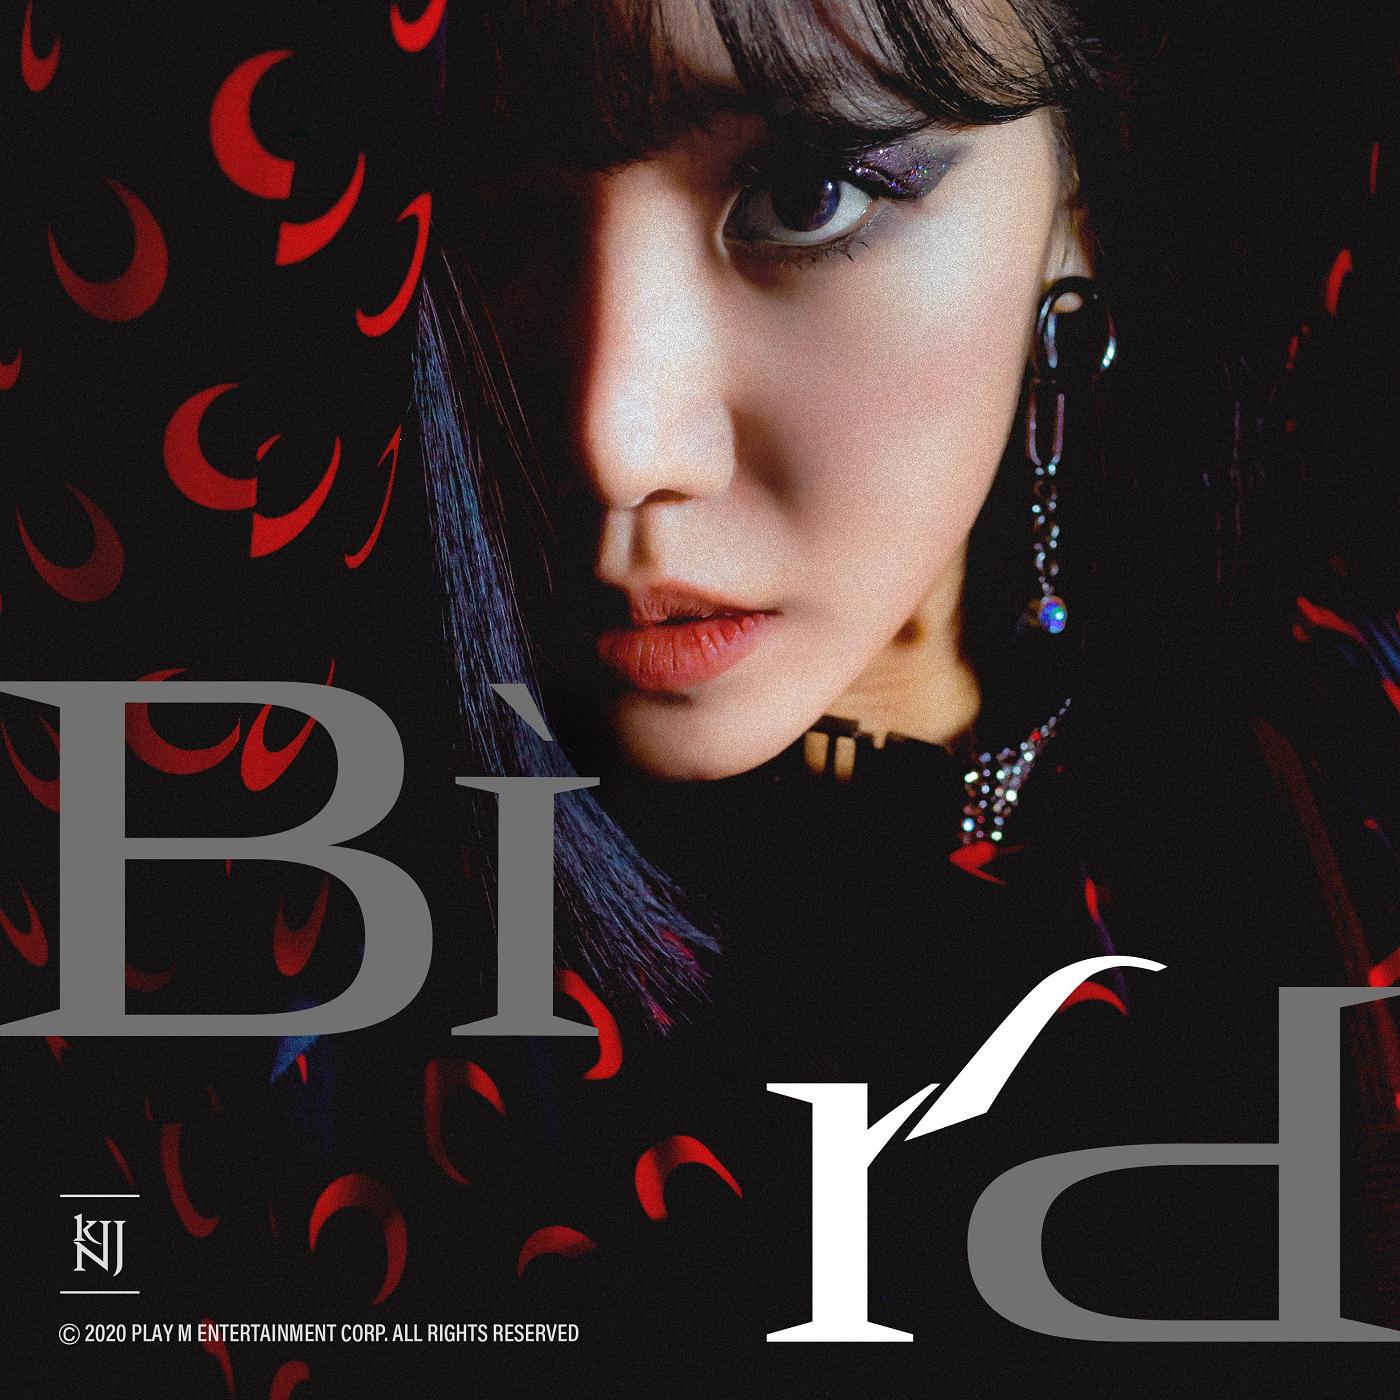 Bird (Kim Nam Joo)